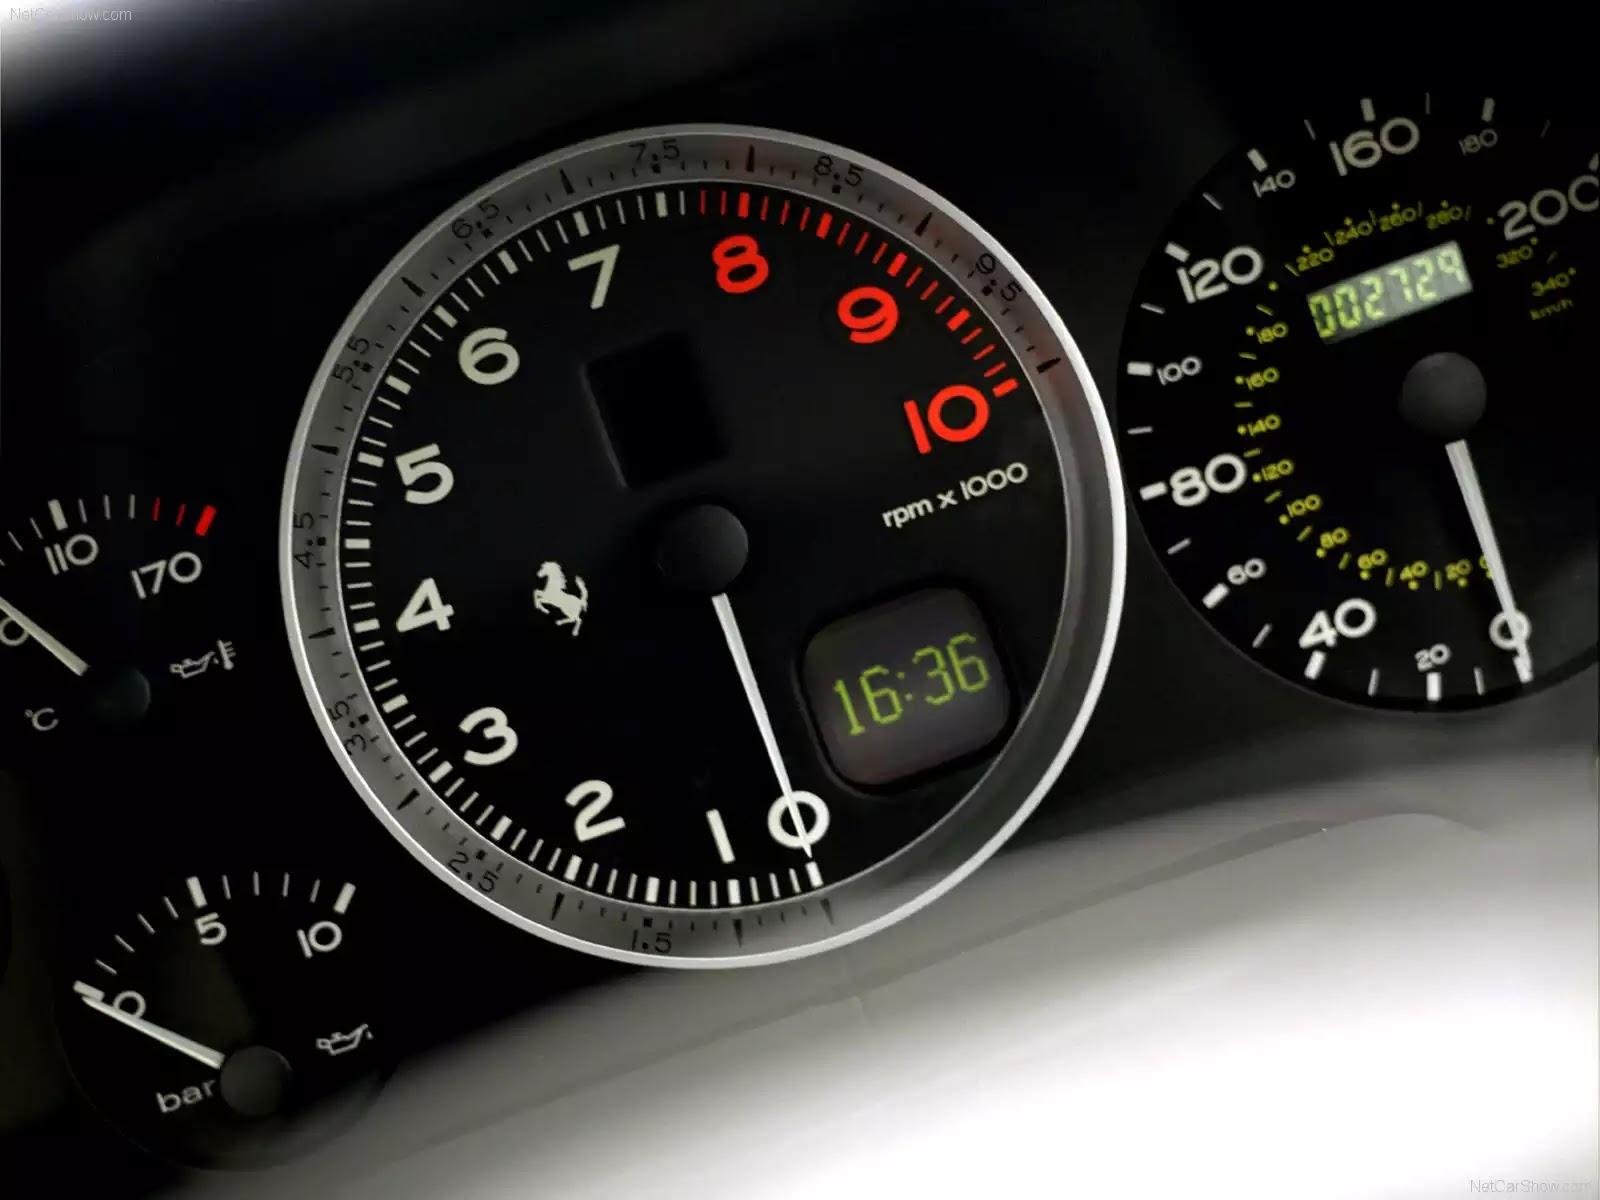 Hình ảnh siêu xe Ferrari 575M Maranello 2002 & nội ngoại thất